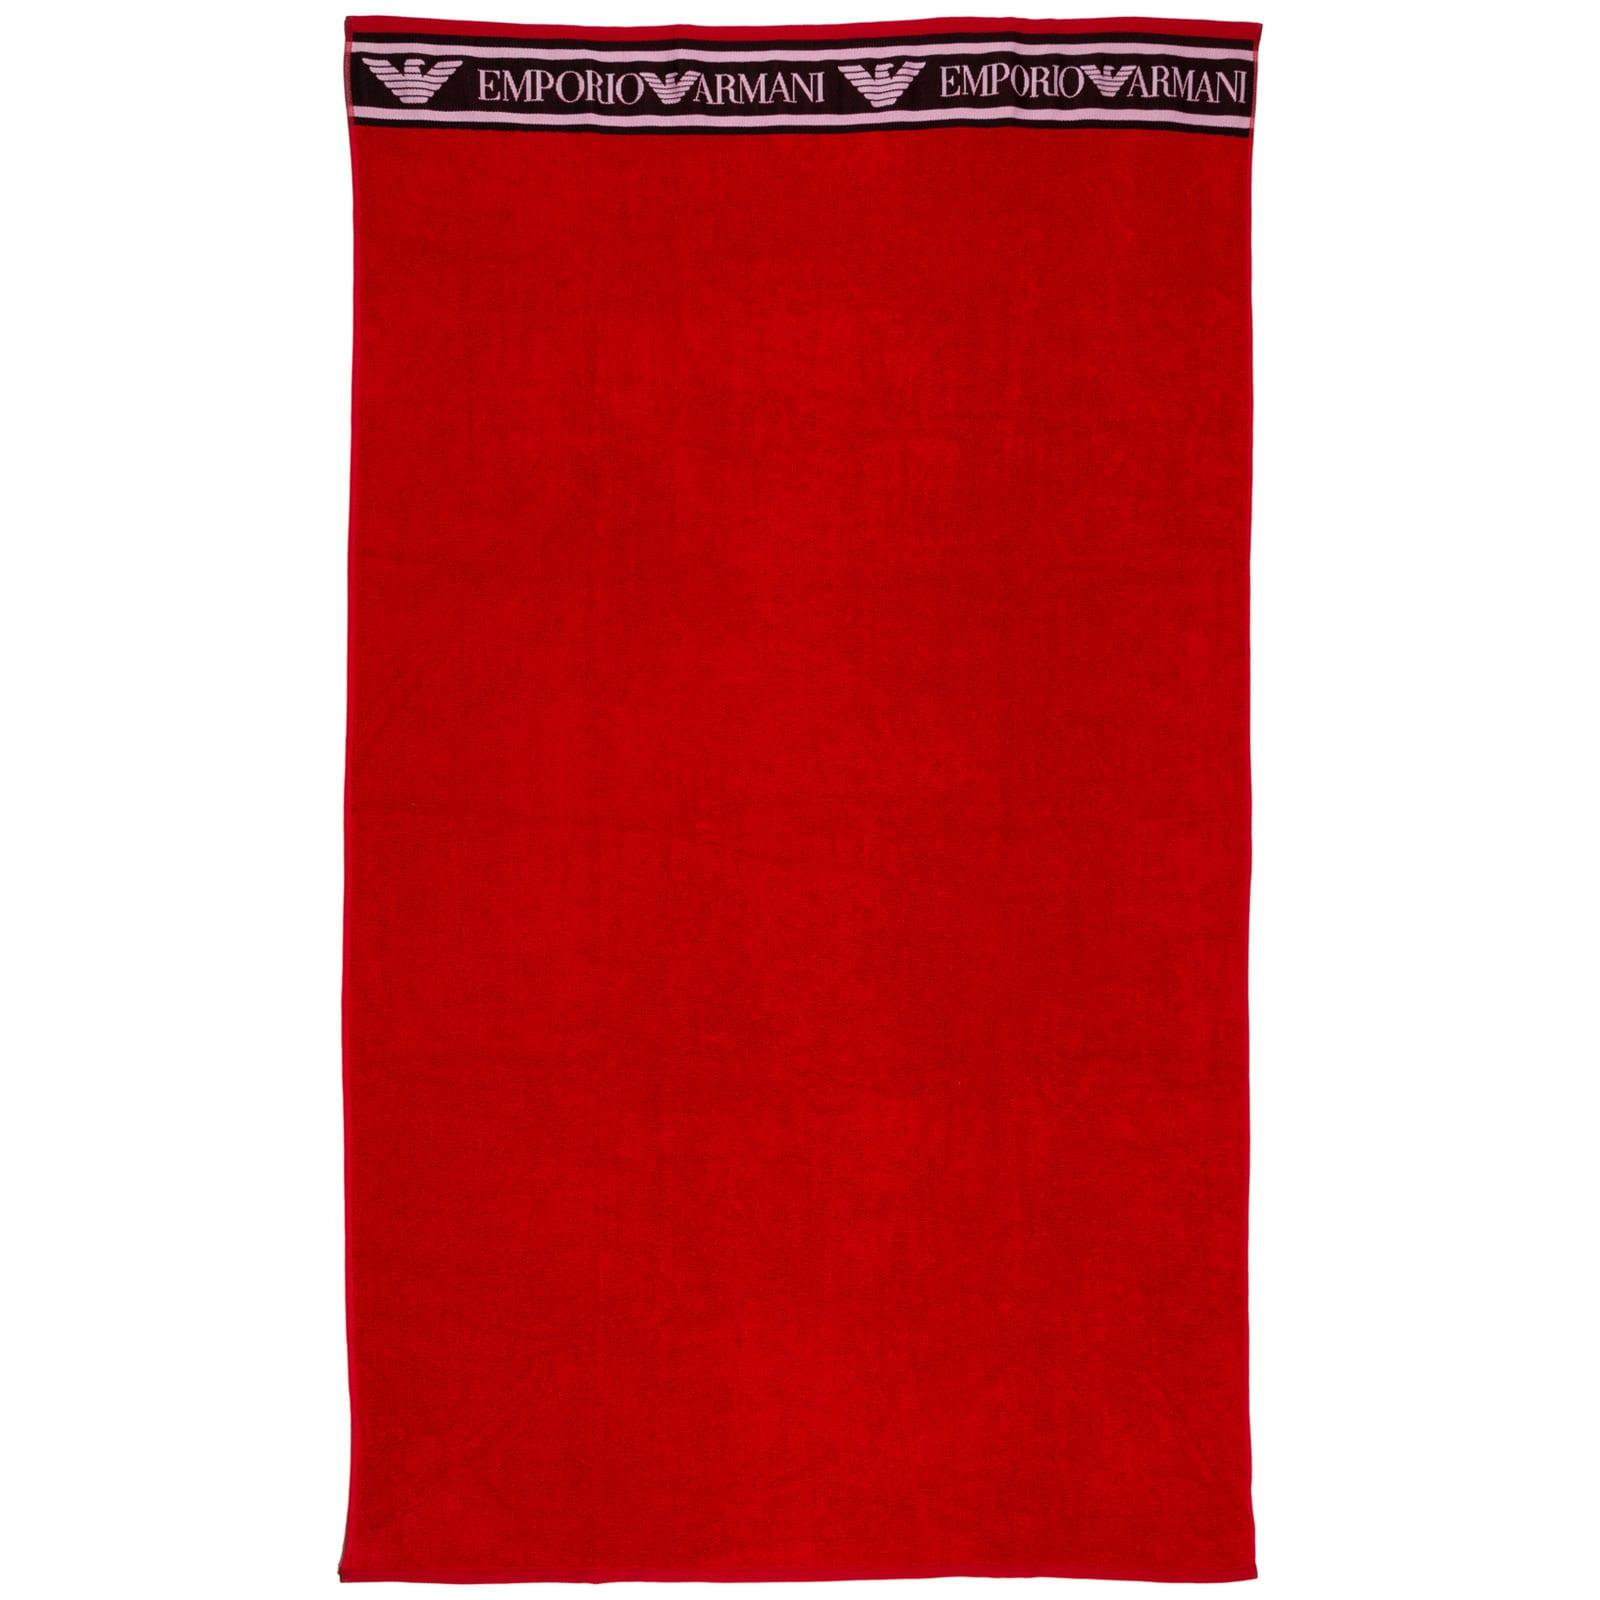 Emporio Armani Cottons LOVE PUFF BEACH TOWELS